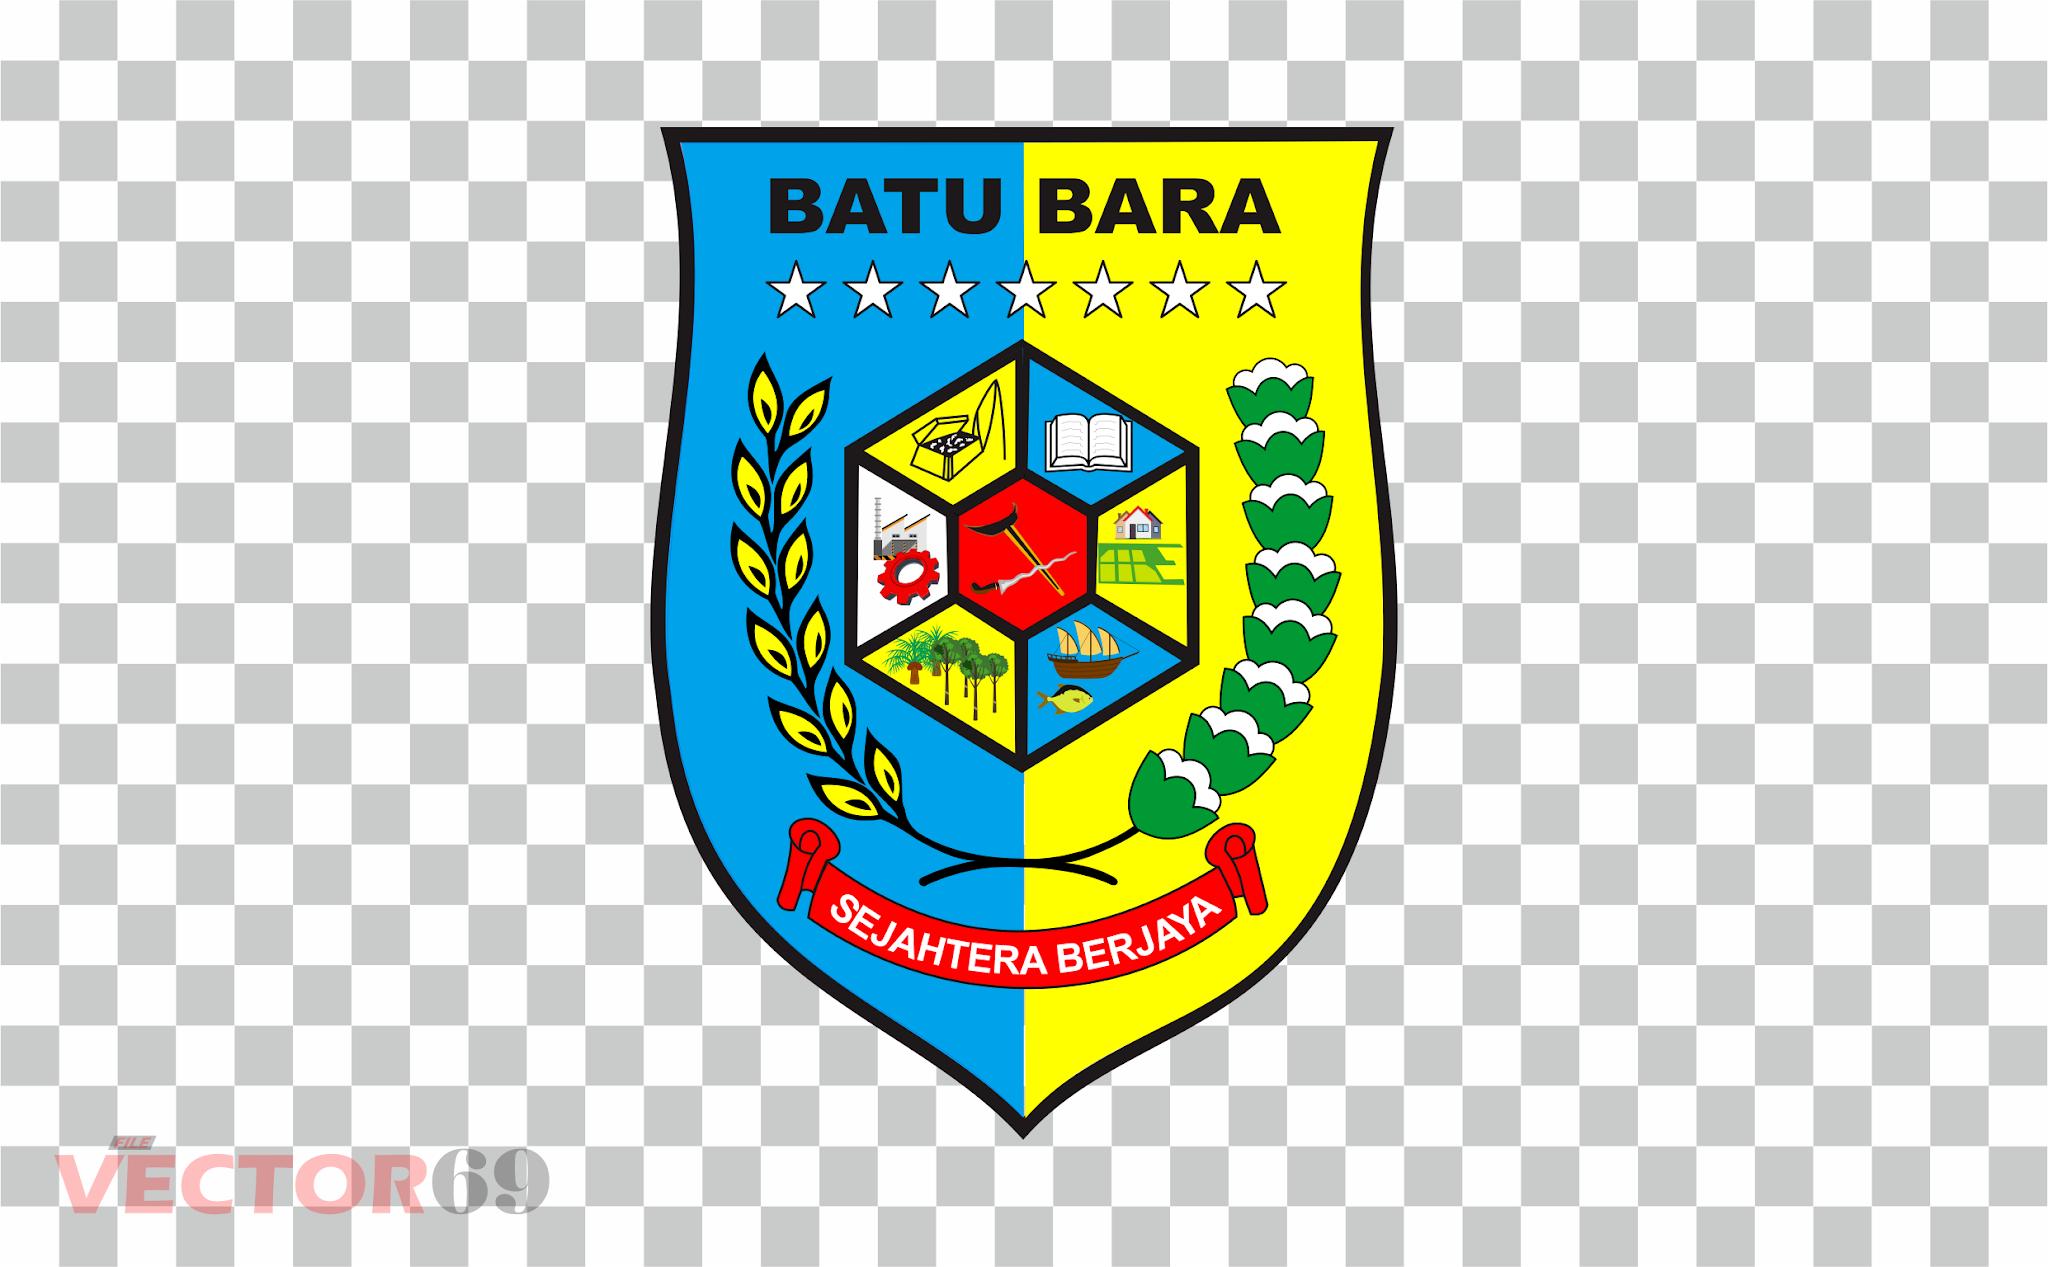 Kabupaten Batu Bara Logo - Download Vector File PNG (Portable Network Graphics)